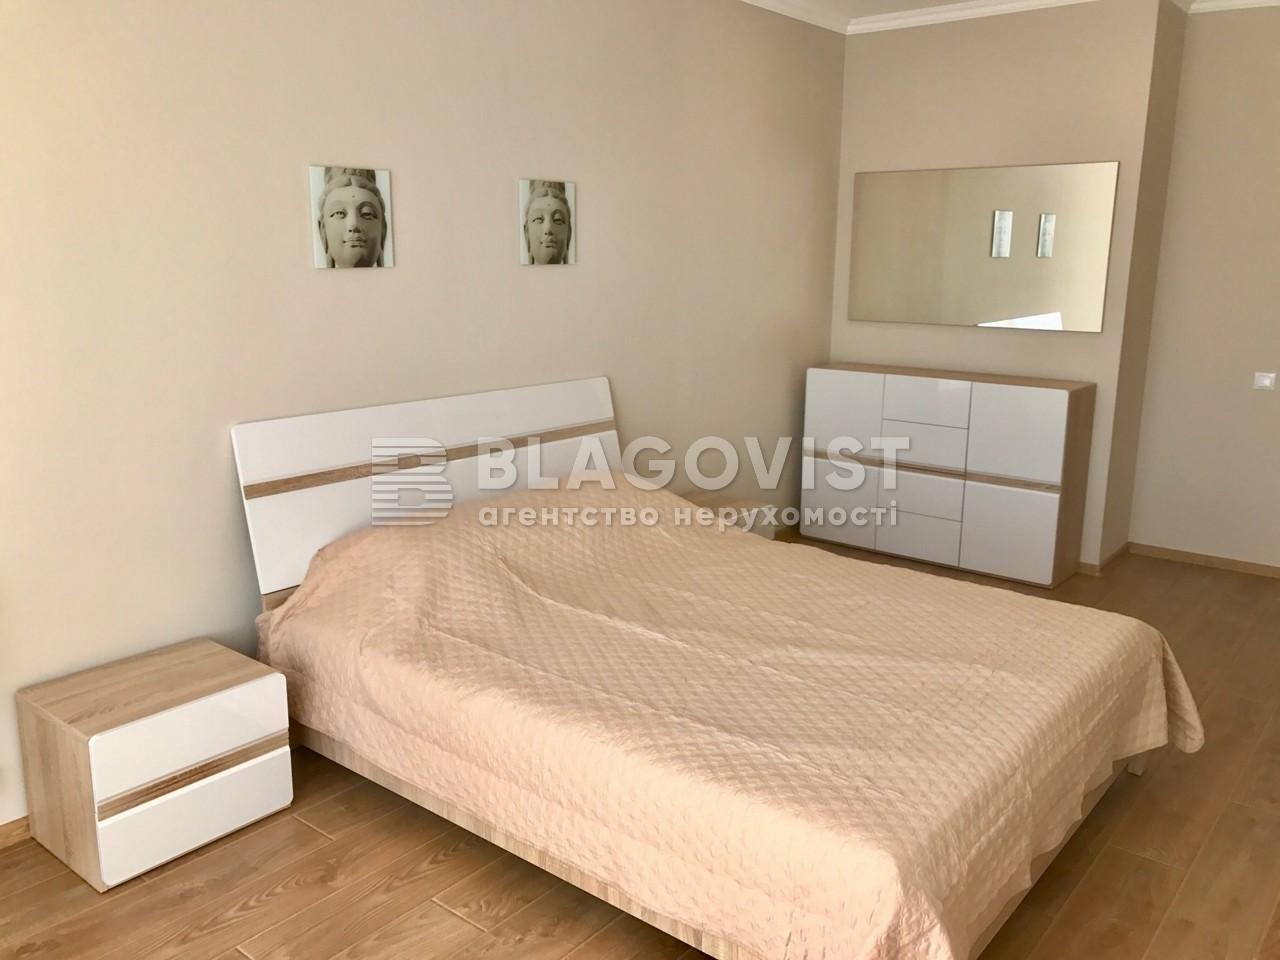 Квартира E-36497, Героев Сталинграда просп., 2д, Киев - Фото 11